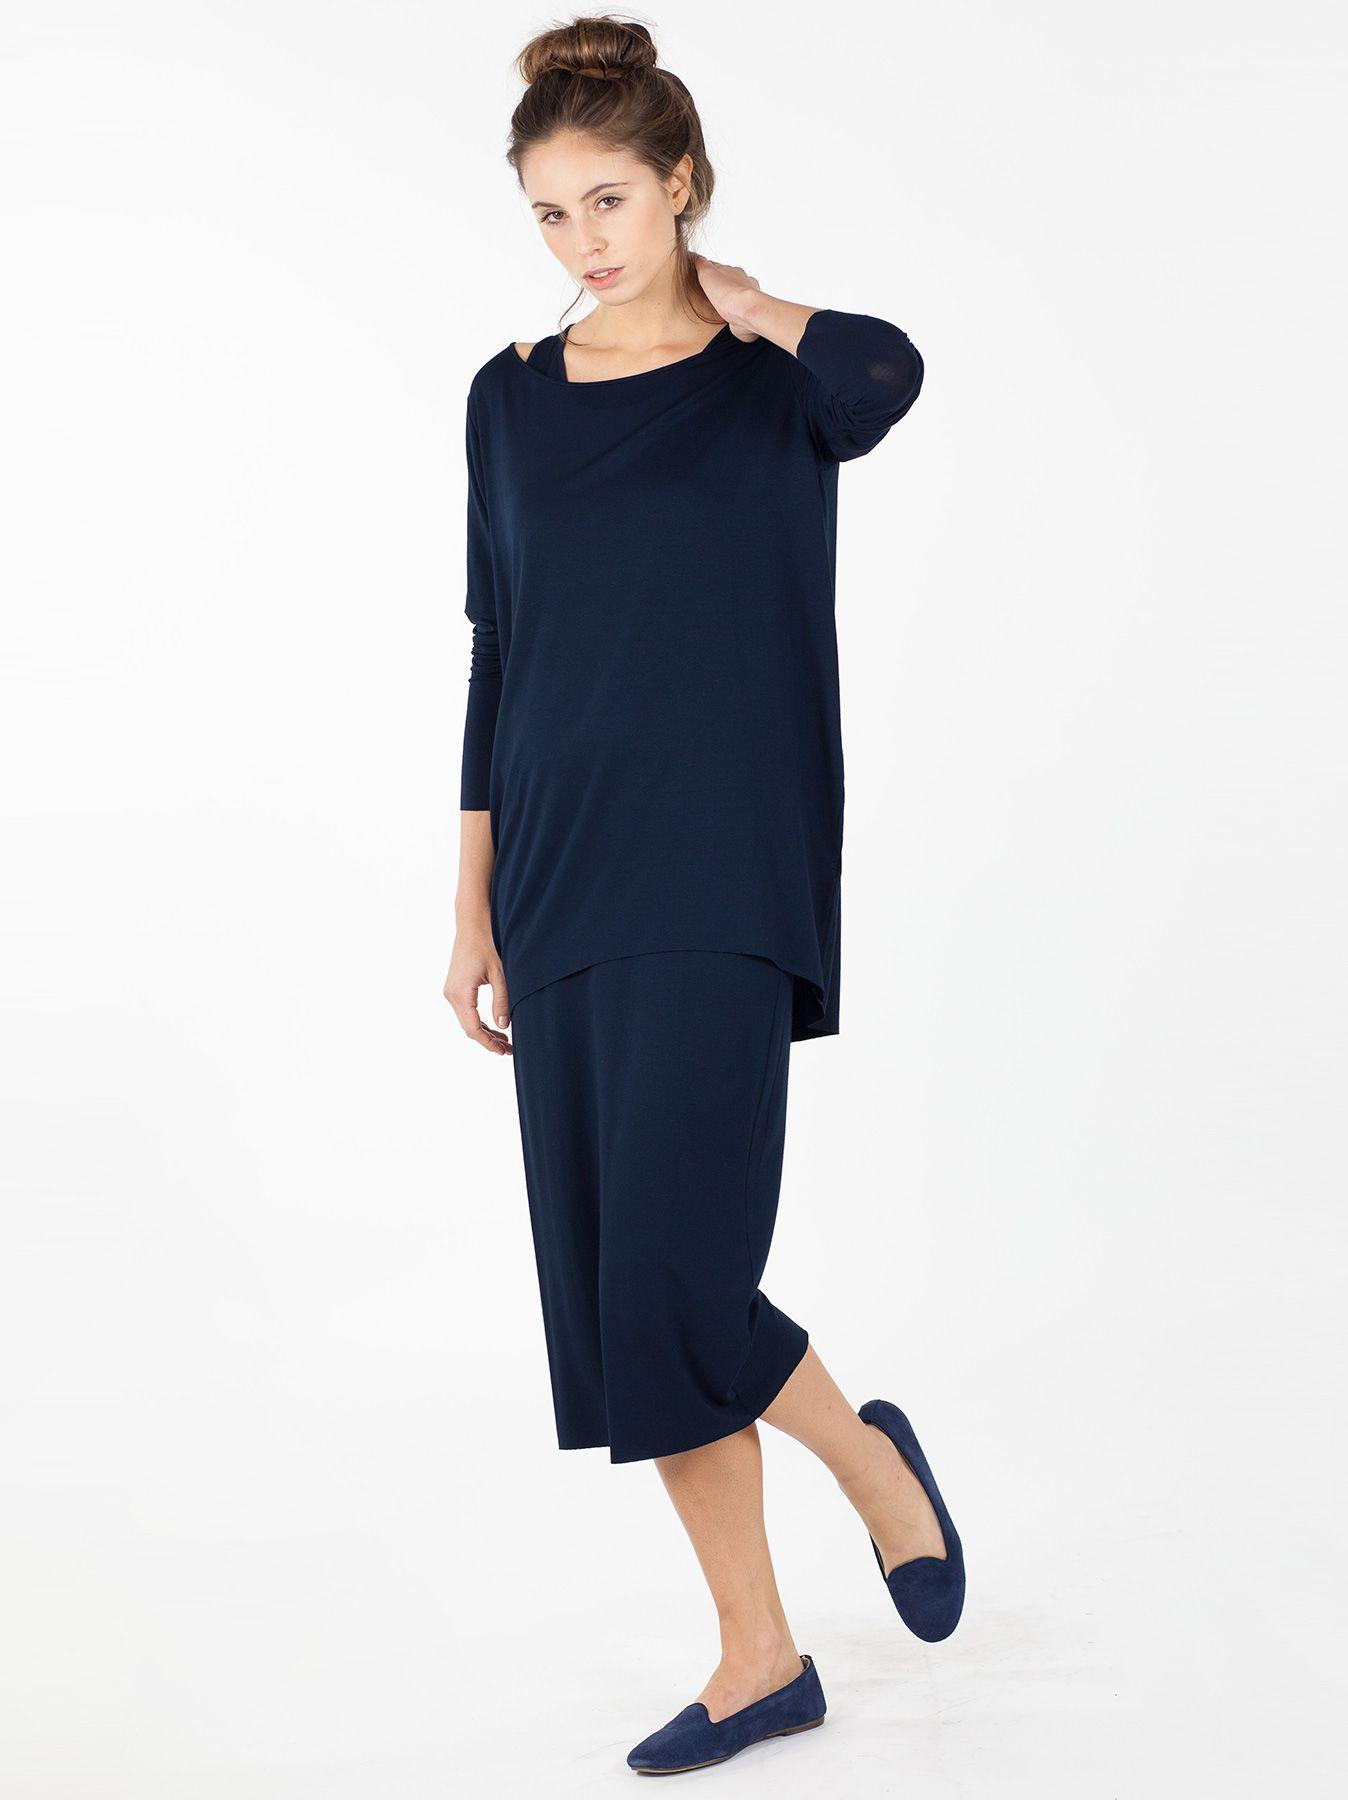 T-shirt ovetto blu